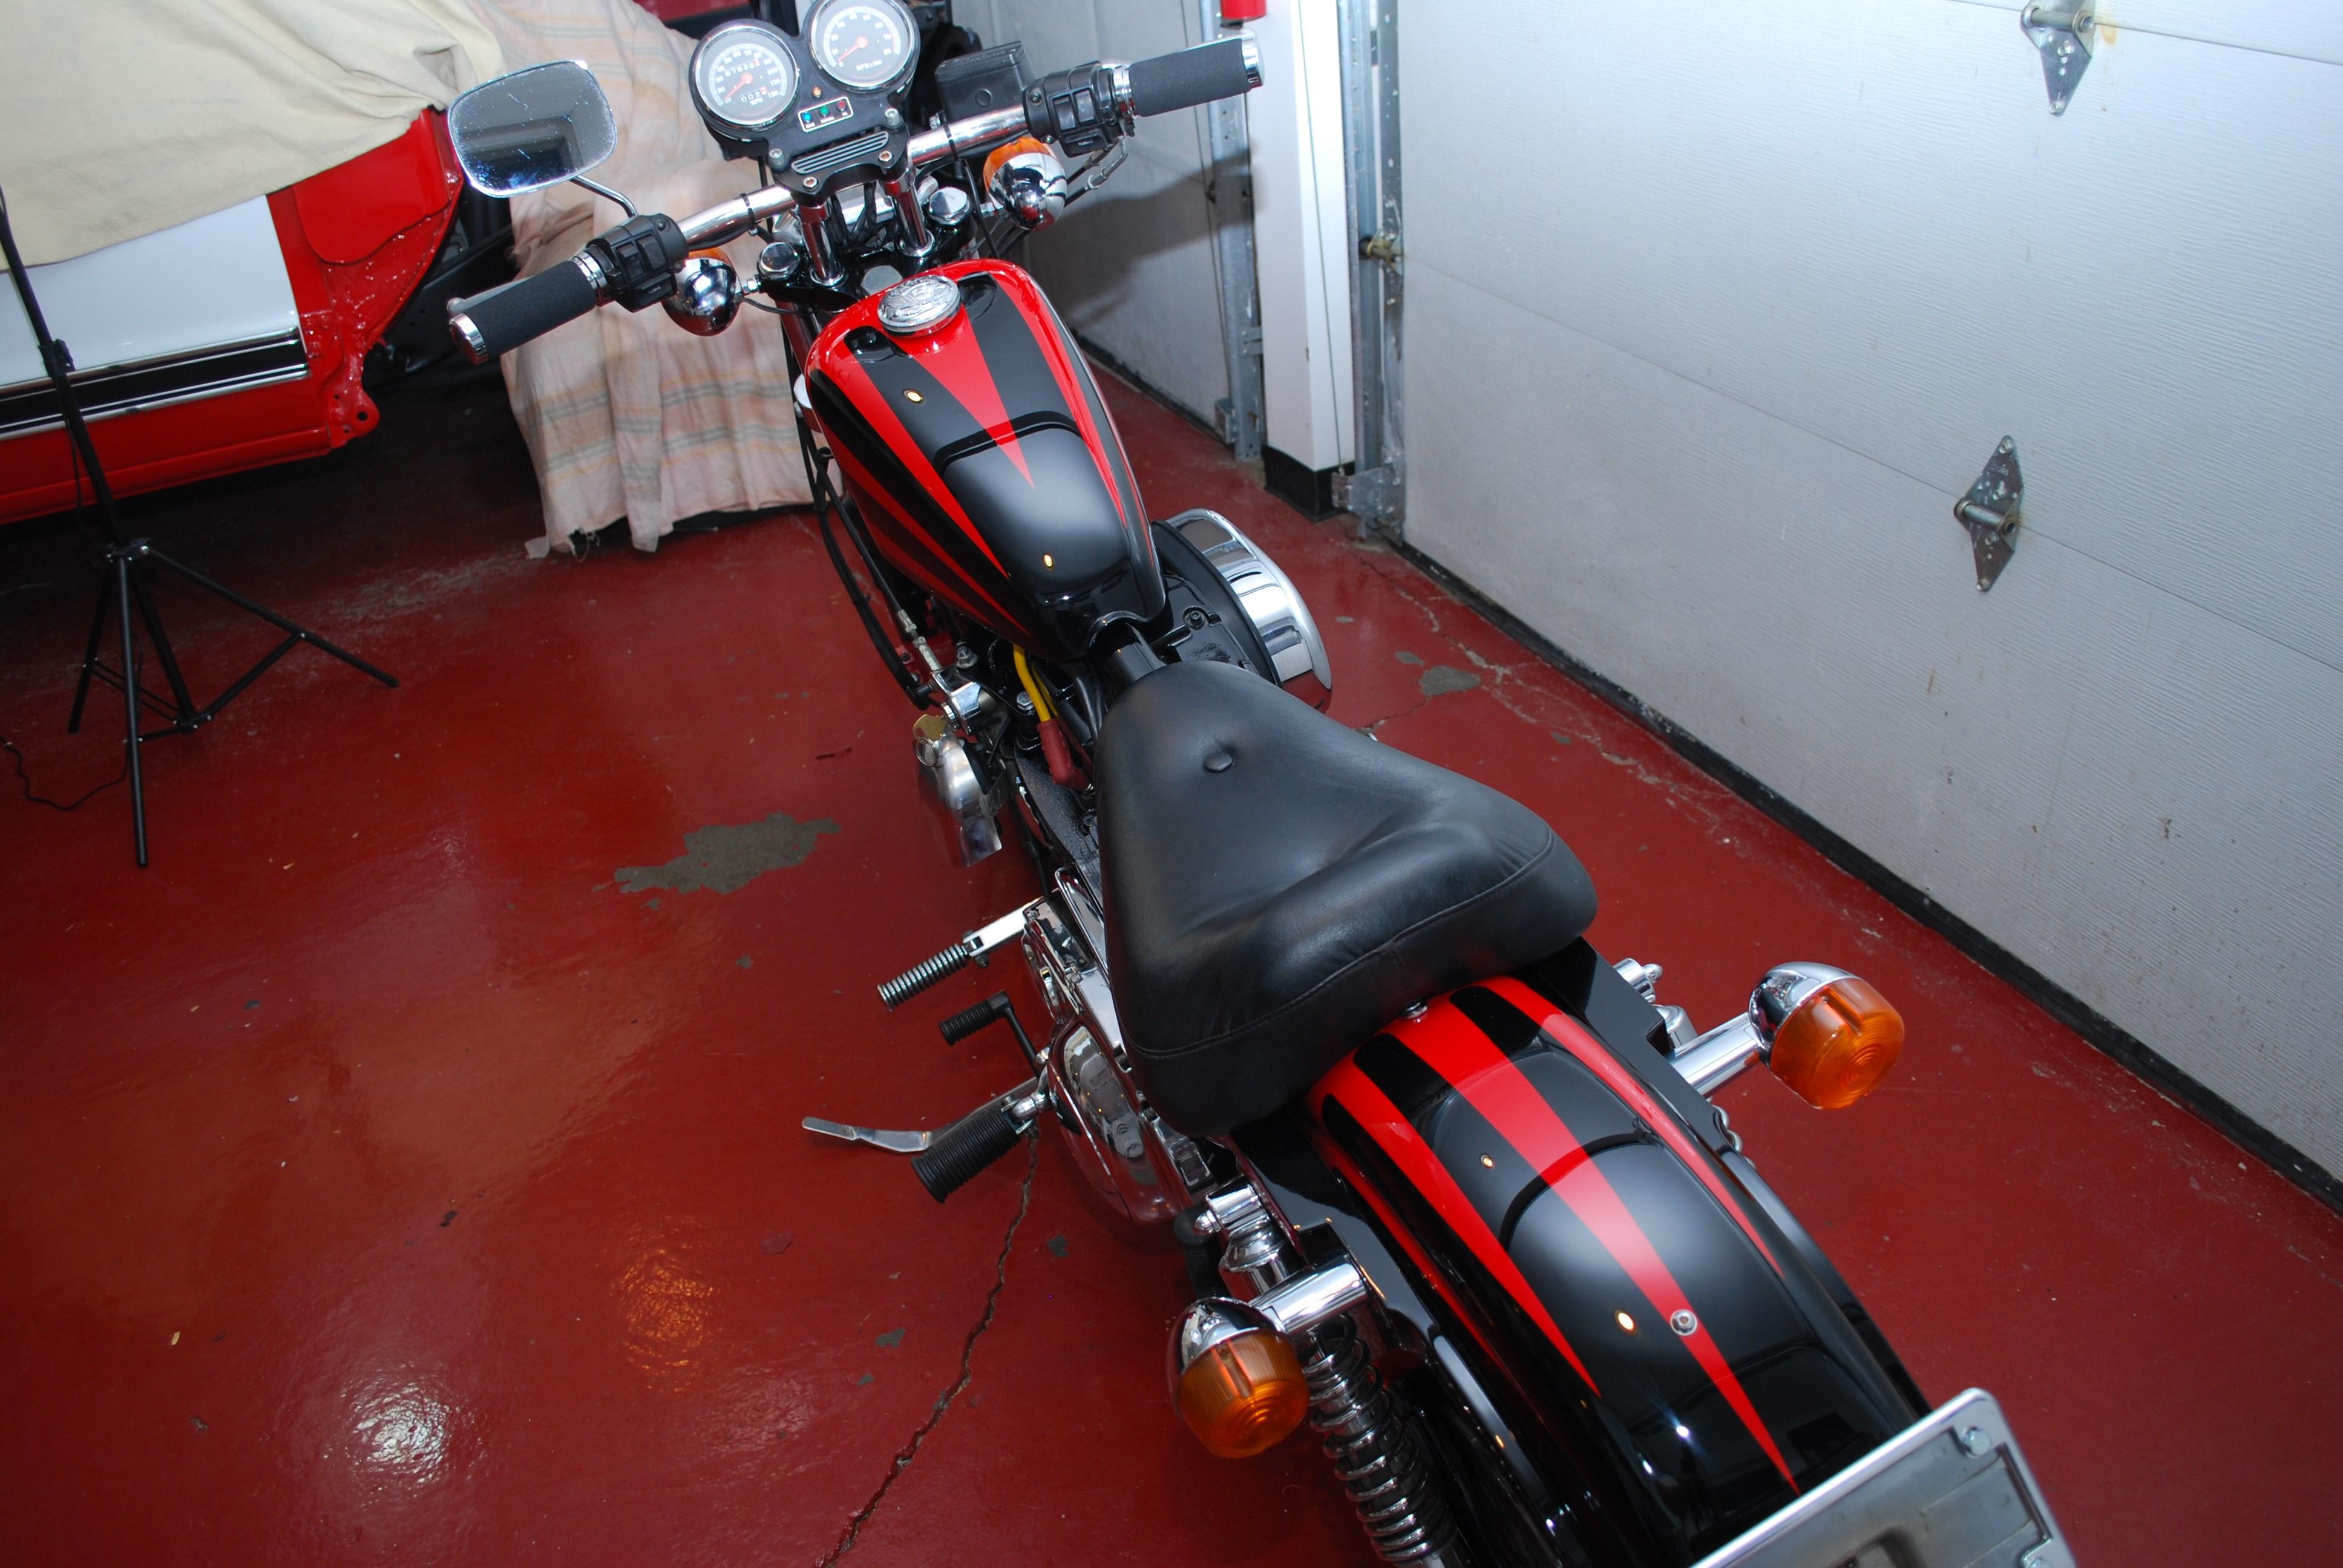 1986 Harley Davidson Xlh 1100 Sportster Red Black Dudley Massachusetts 561008 Chopperexchange